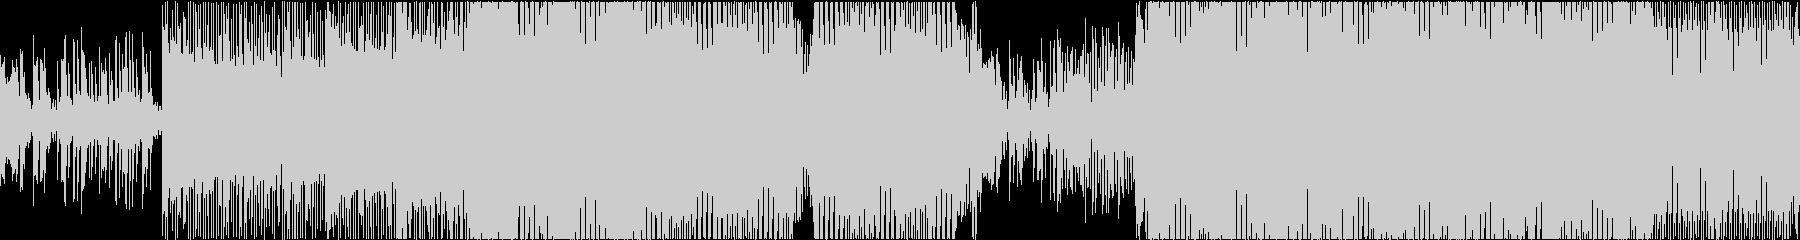 EDM リアル 明るい ピアノ ループの未再生の波形